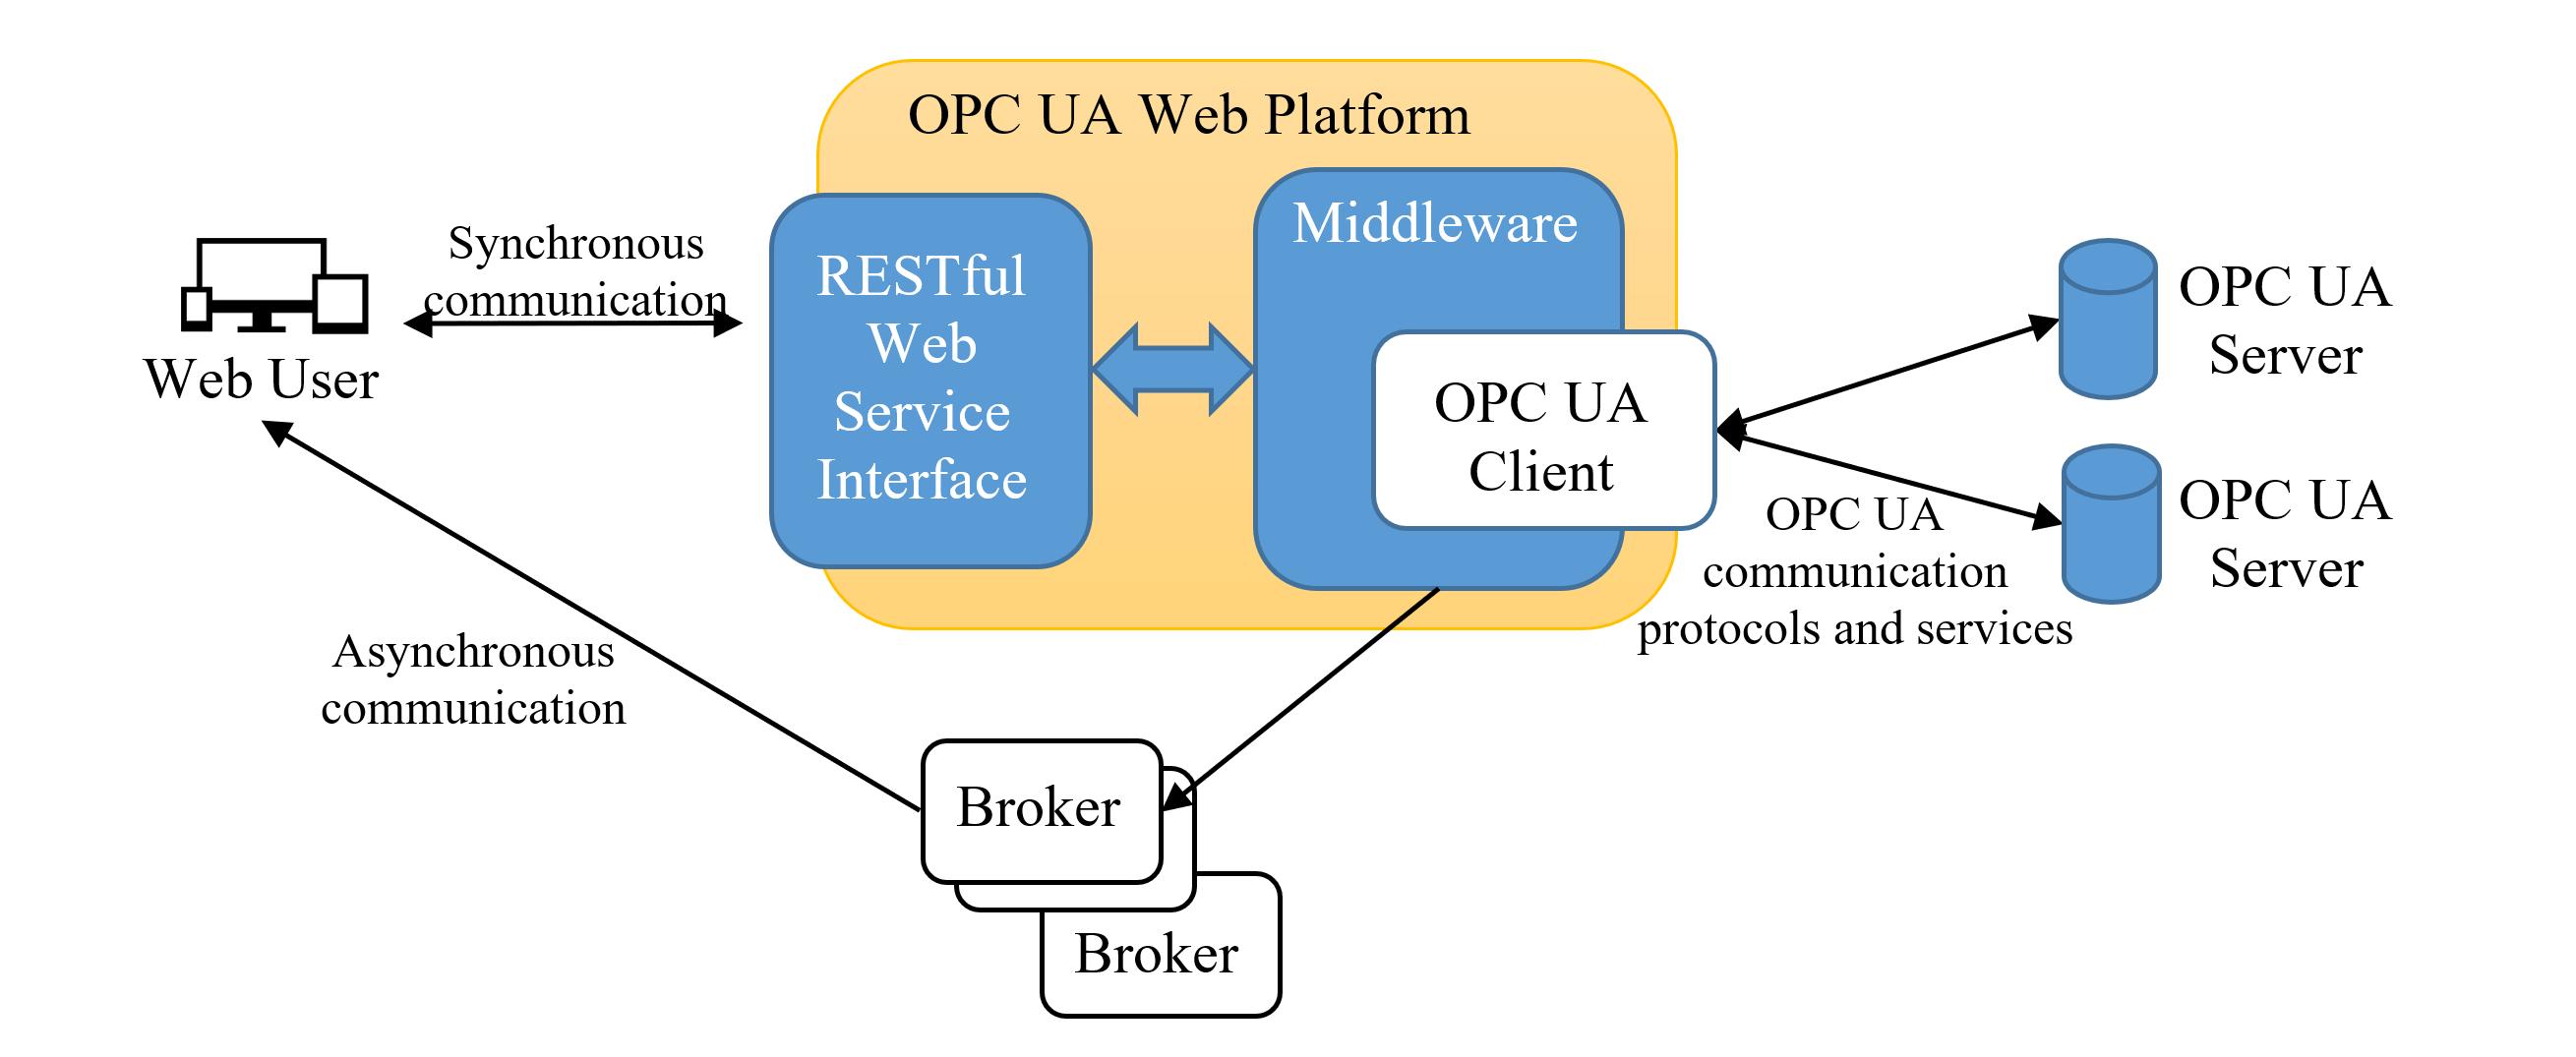 GitHub - OPCUAUniCT/OPCUAWebPlatformUniCT: An ASP NET Core